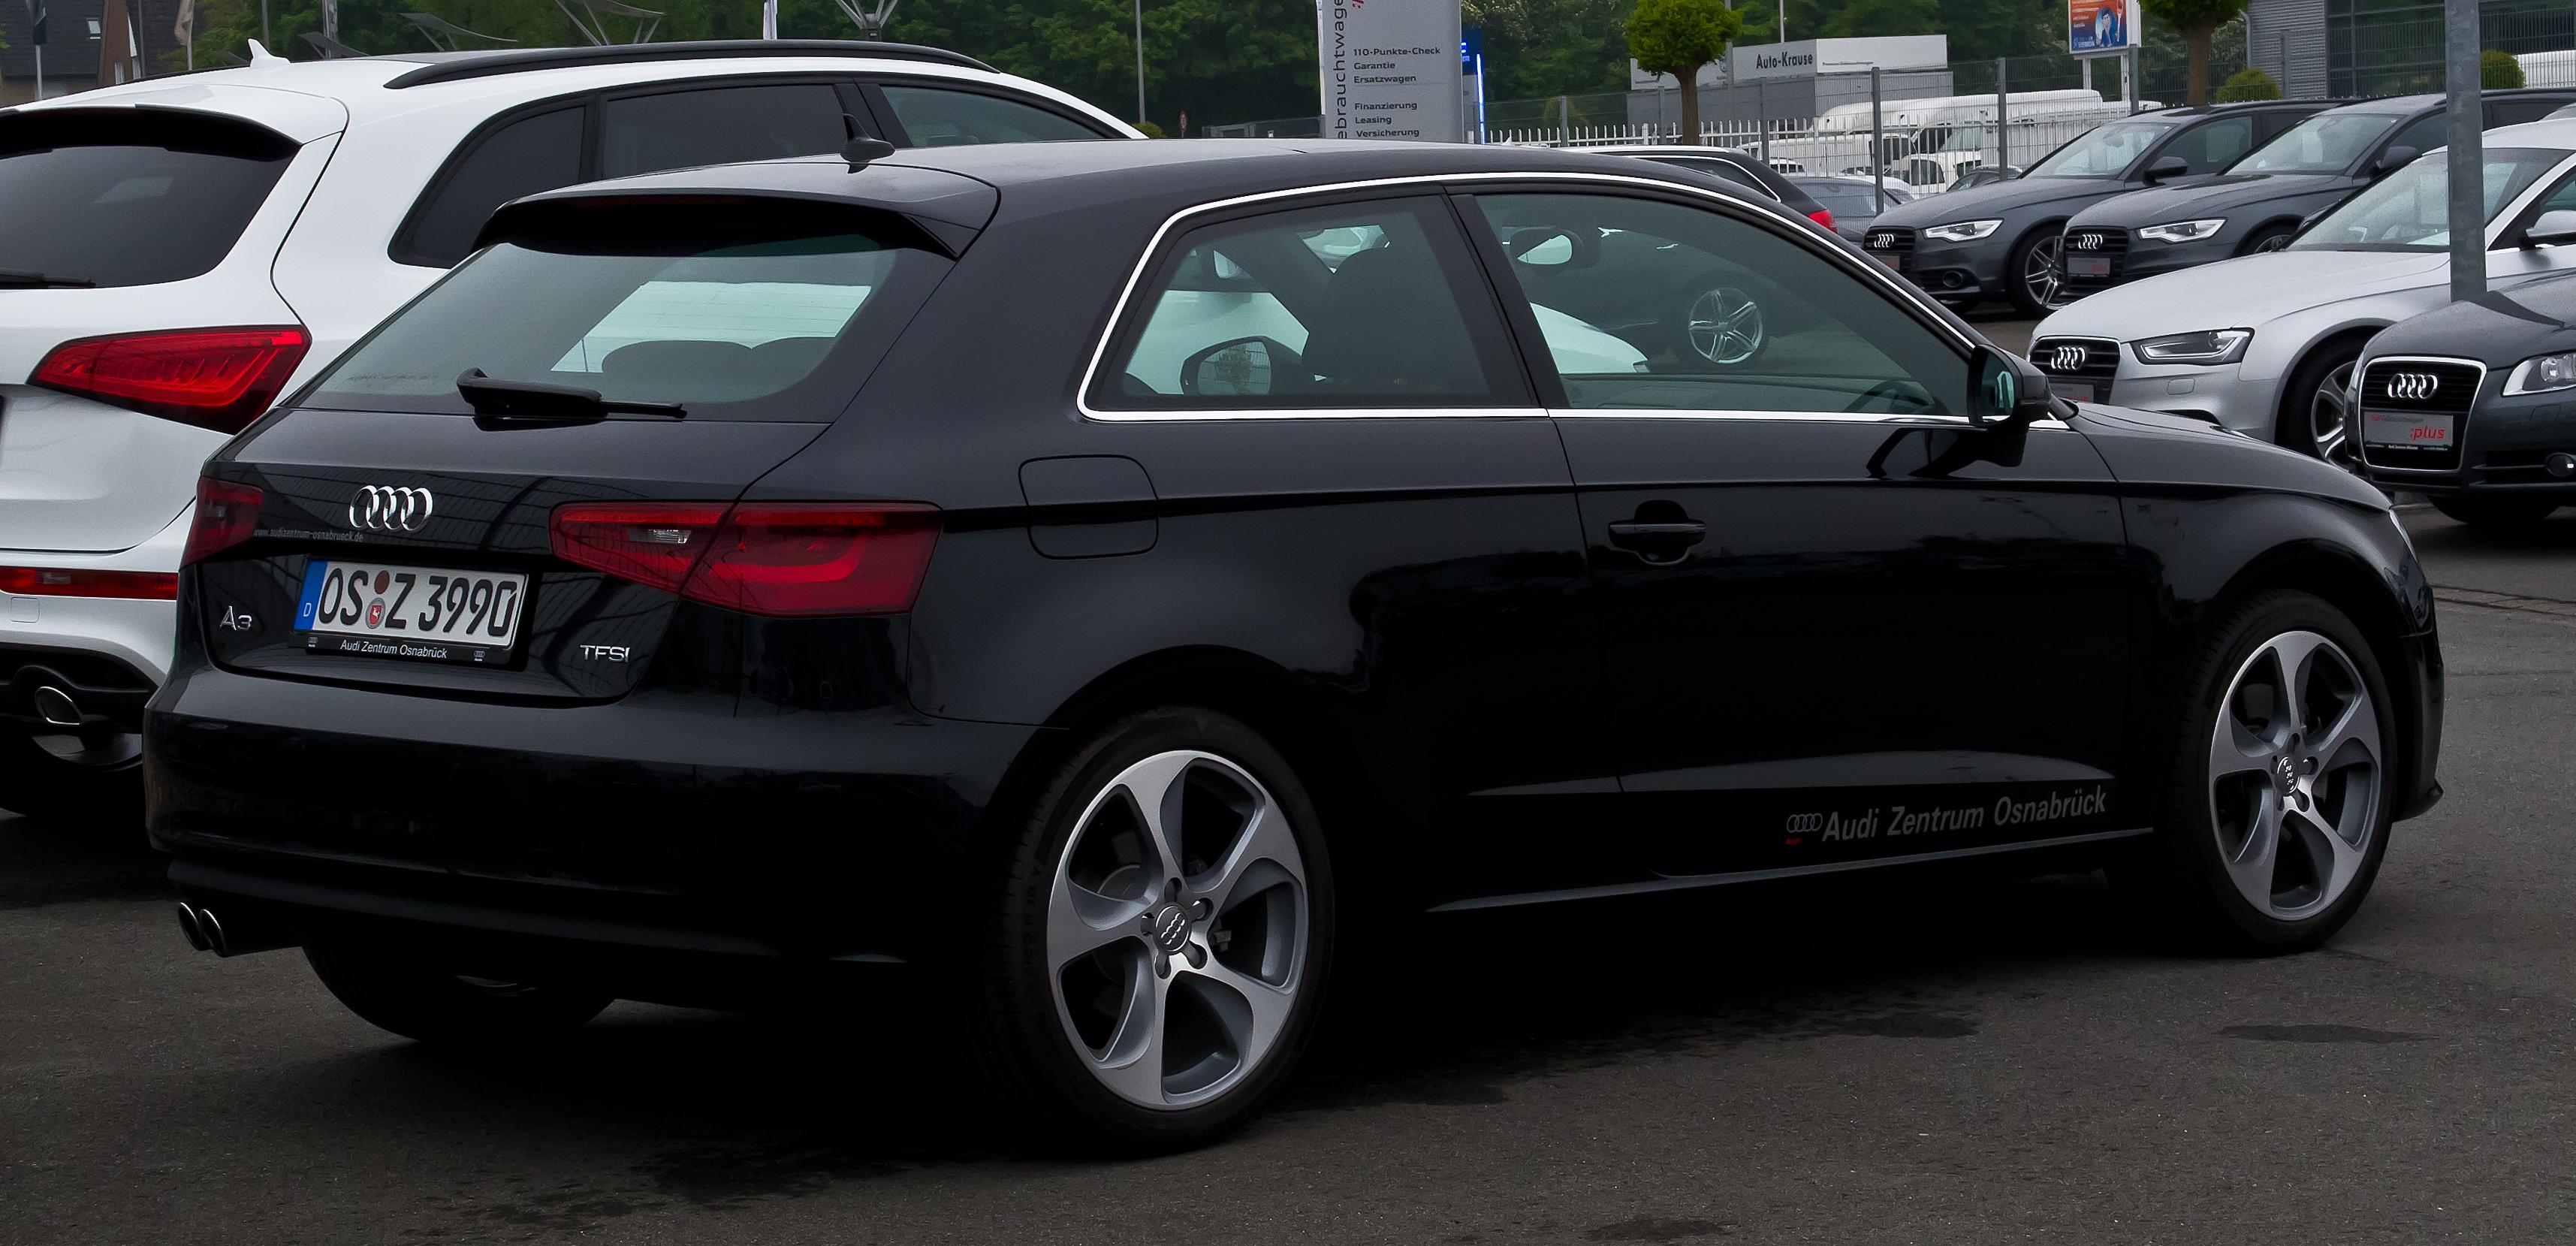 File:Audi A3 1.8 TFSI Ambition (8V) – Heckansicht, 17. Mai ...